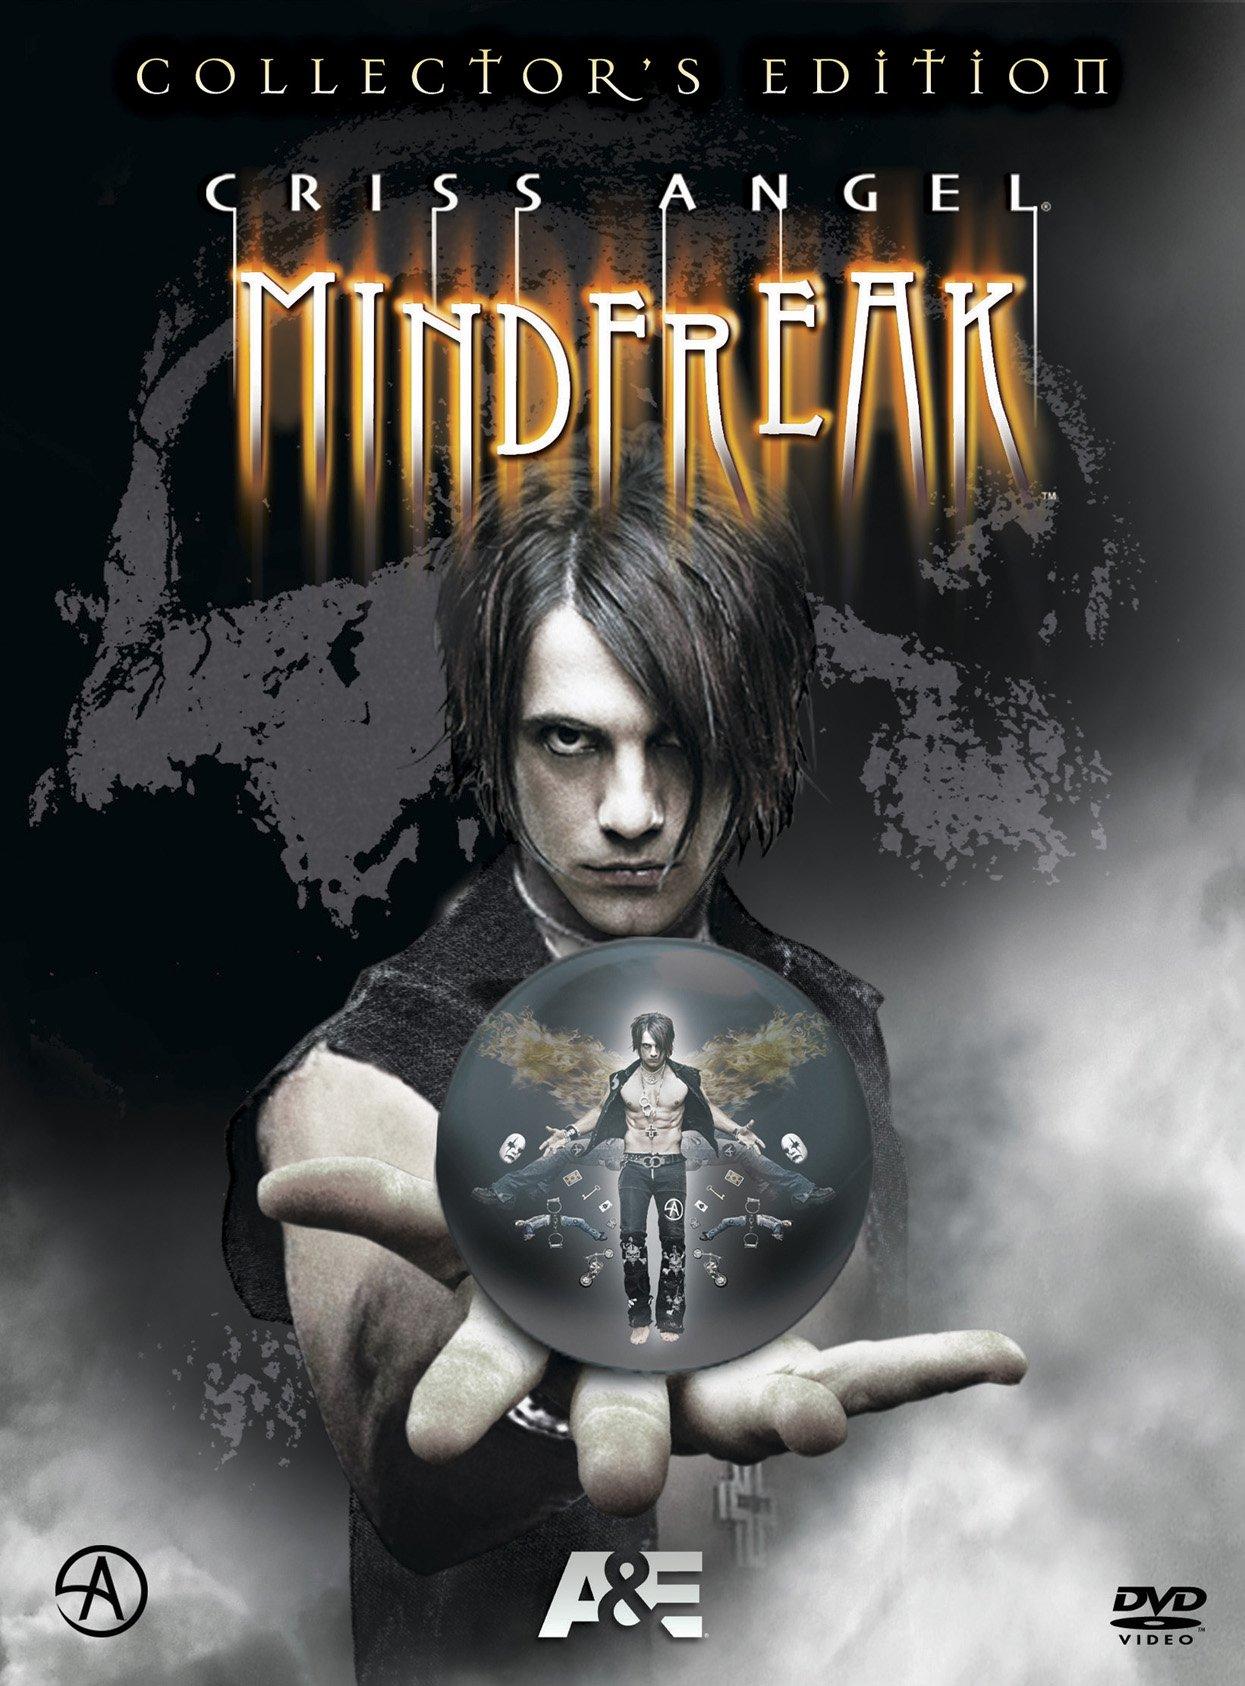 Criss Angel: Mindfreak (Collectors Edition)